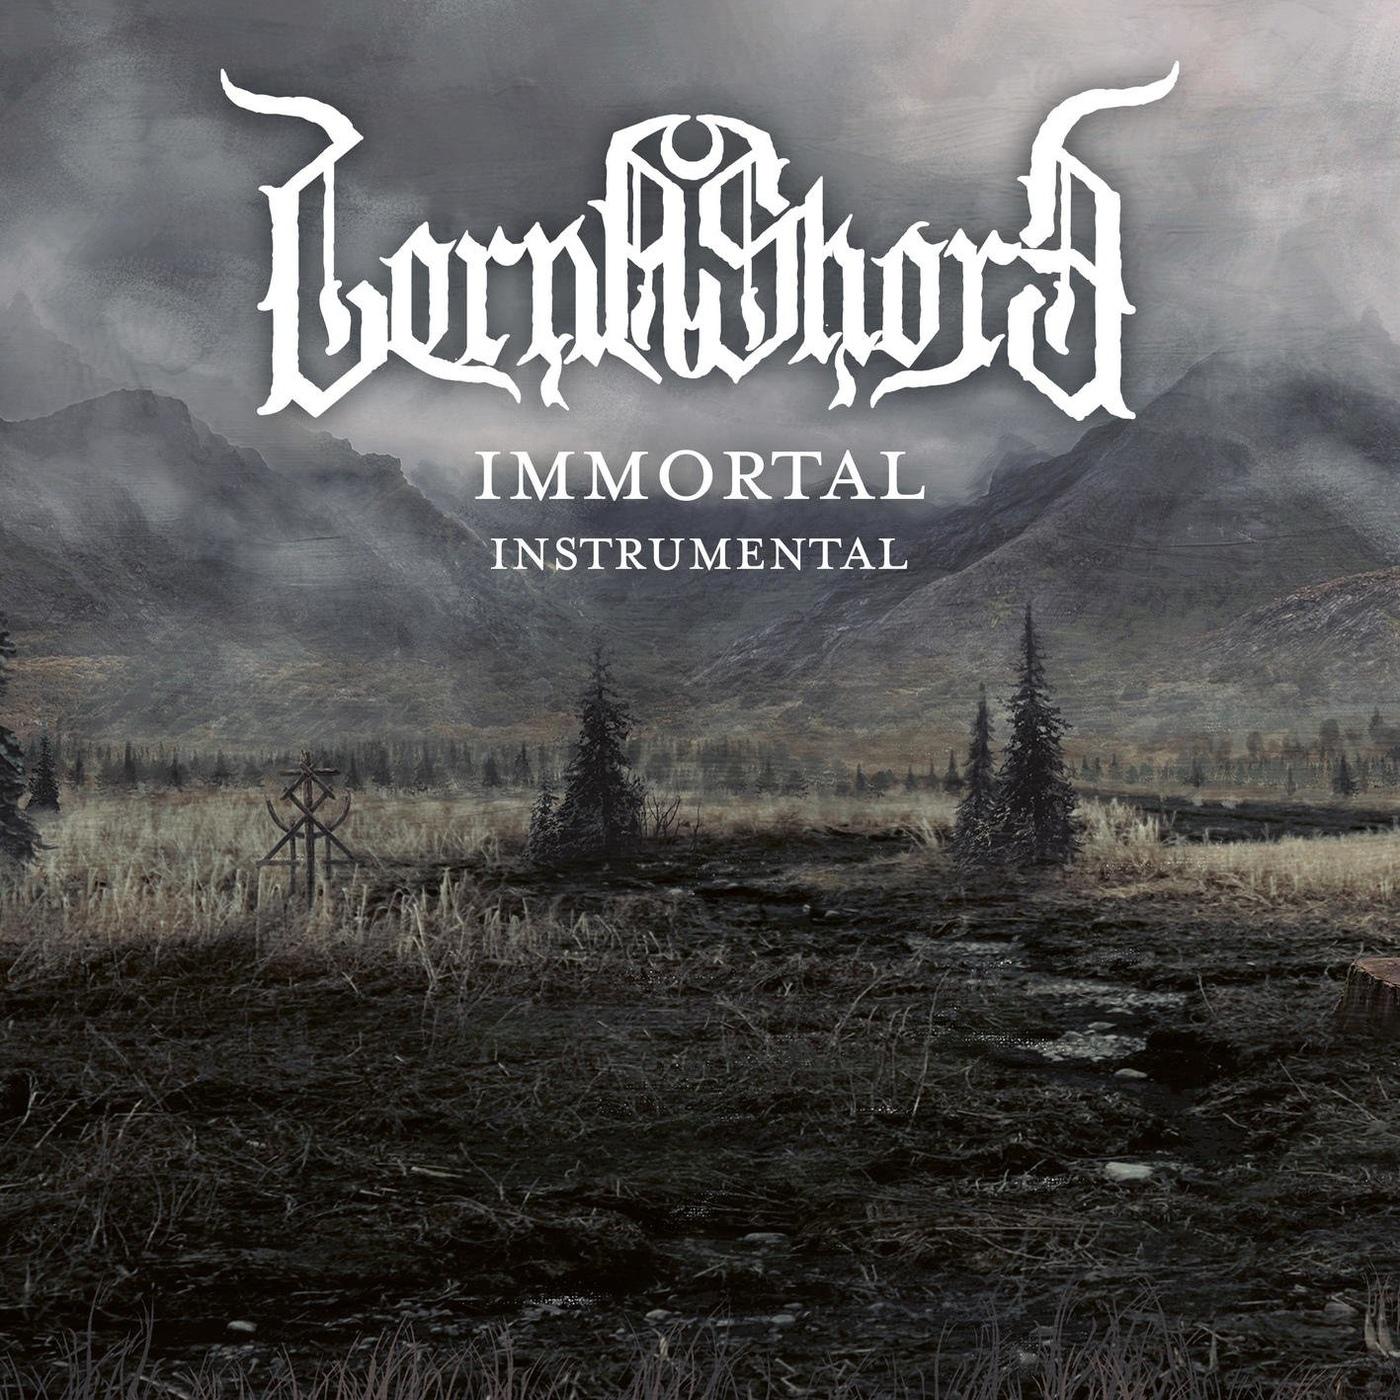 Lorna Shore - Immortal (Instrumental) (2021)